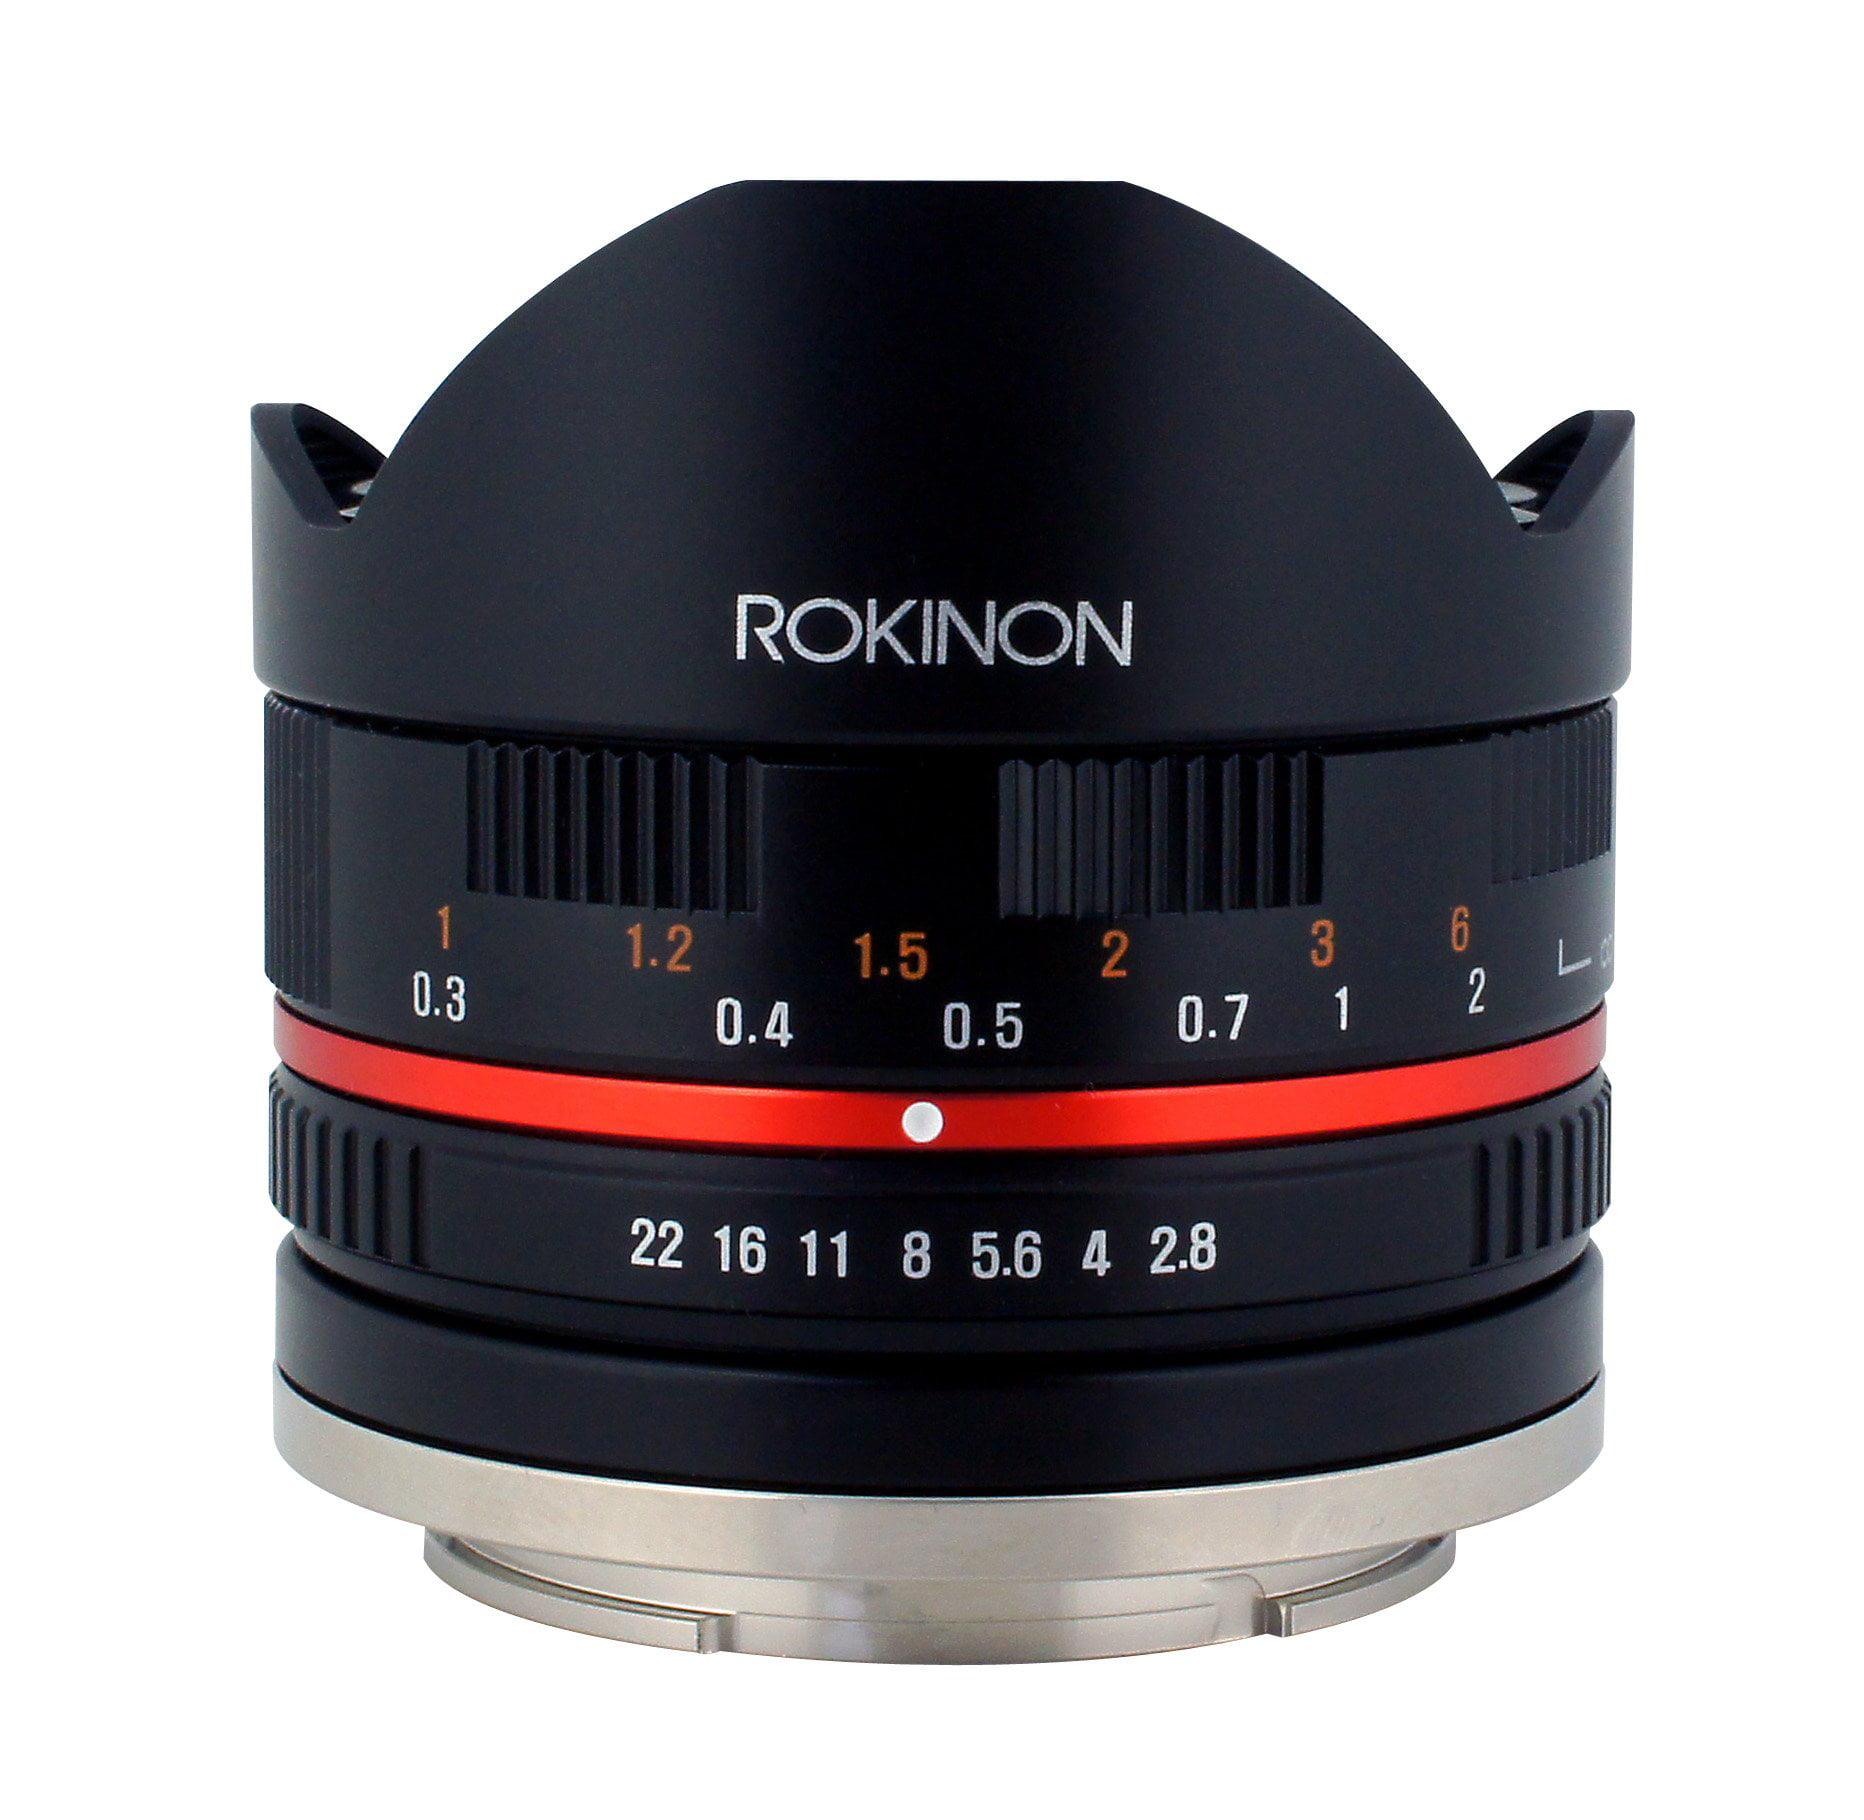 ROKINON RK8MBK28-M Series II 8mm f/2.8 Fisheye Lens